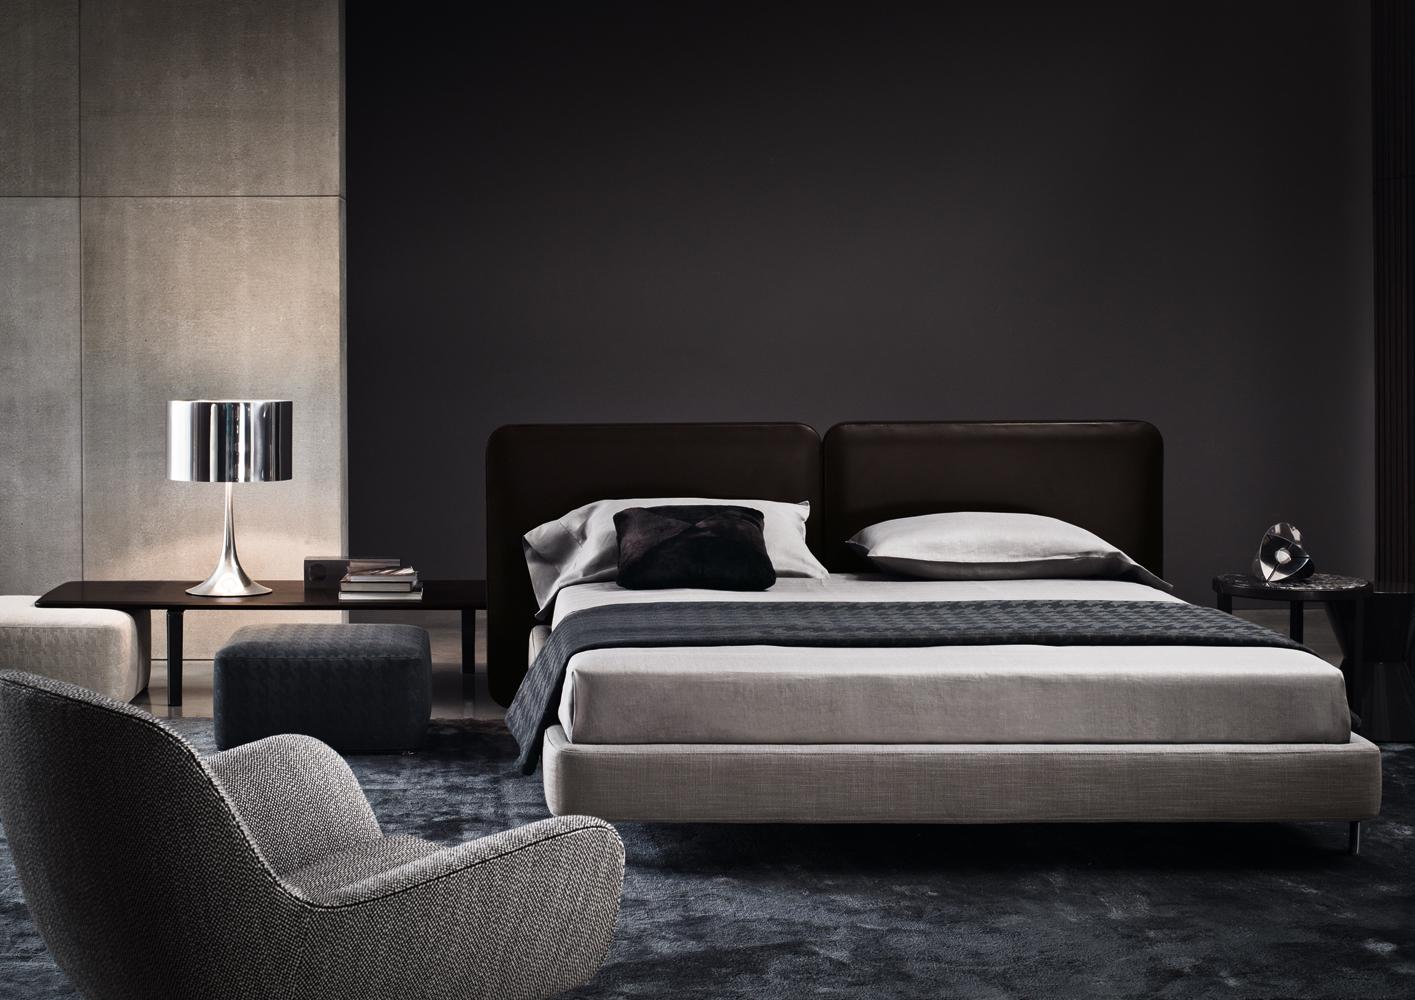 Bedroom Bed Price